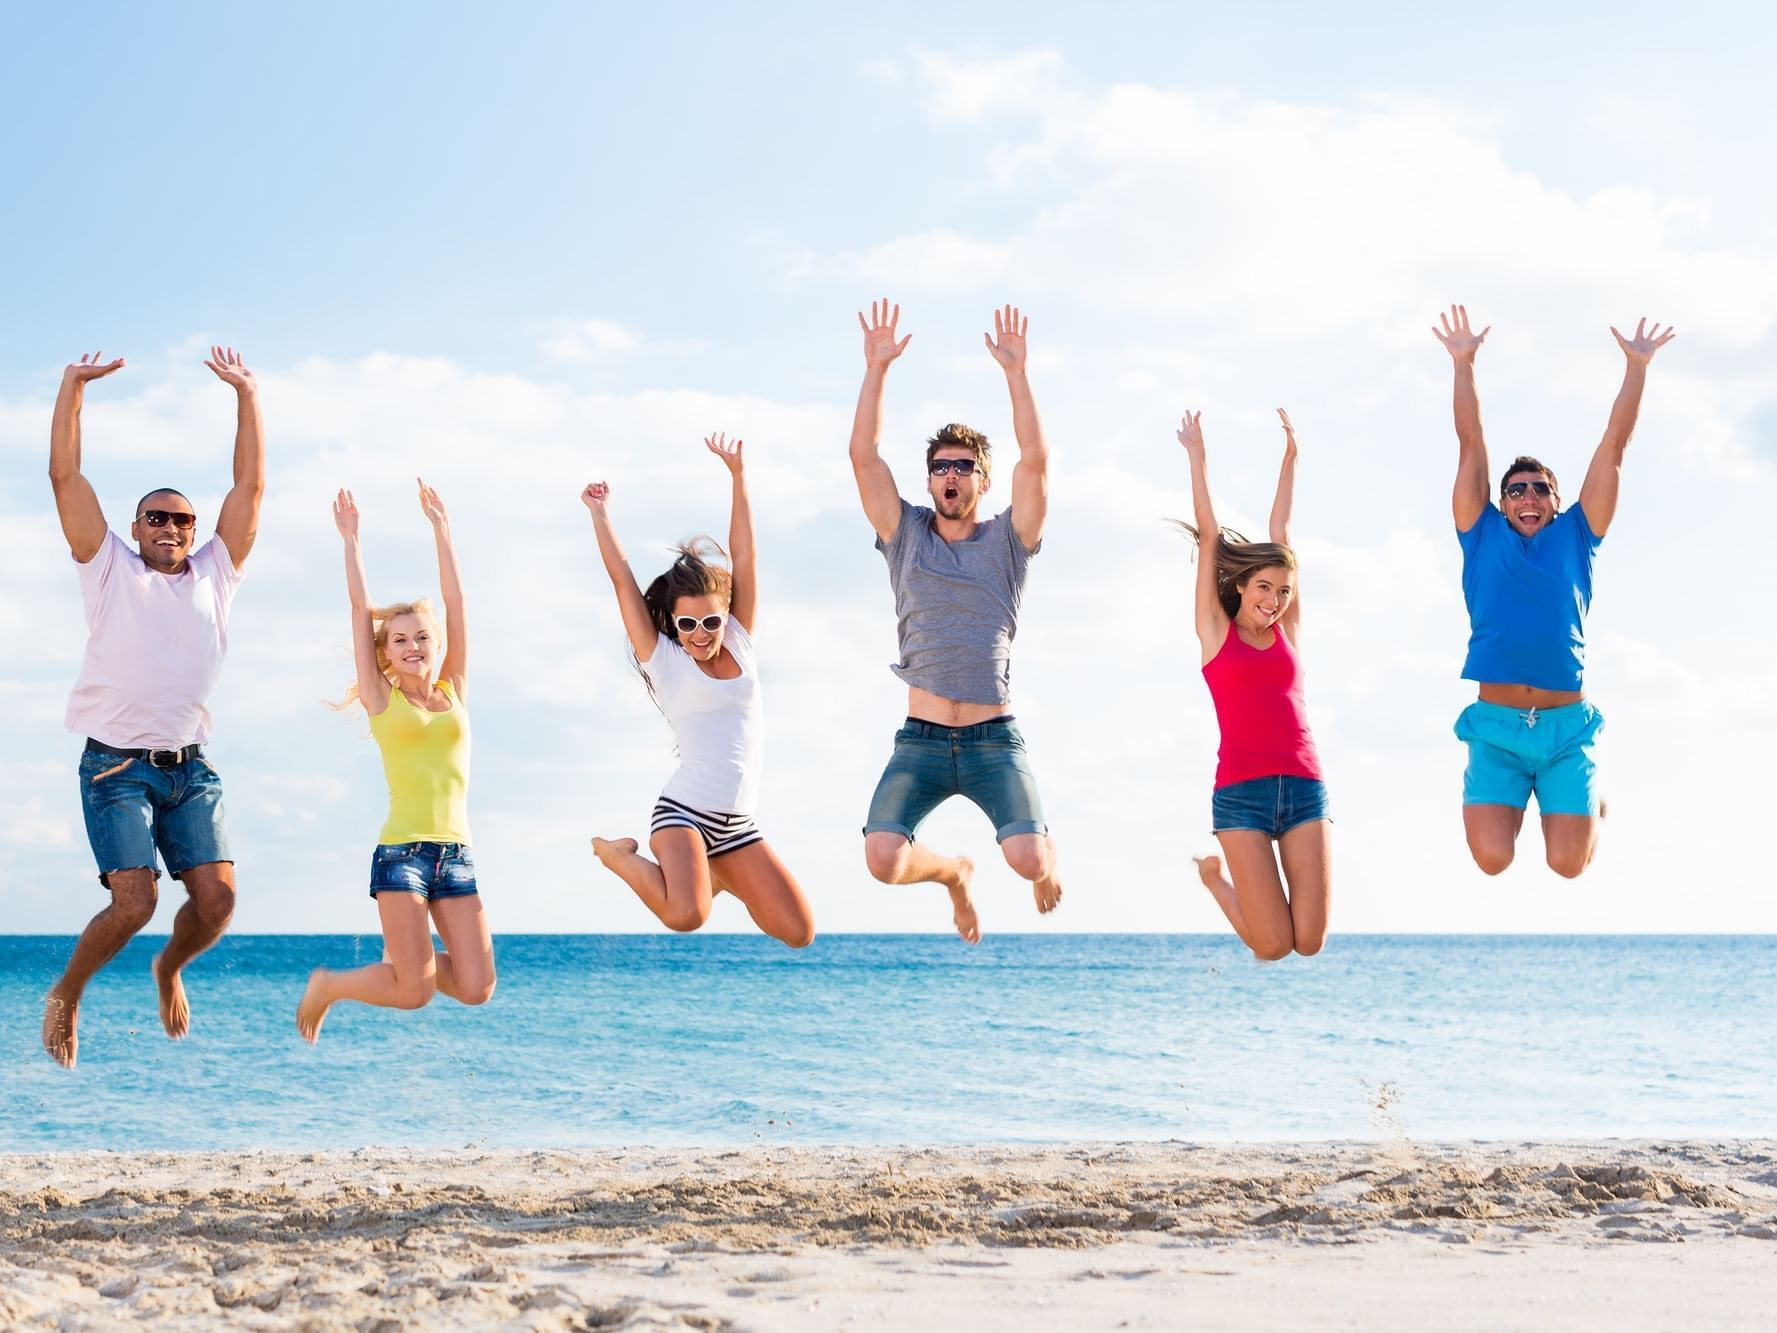 Group of friends having fun on beach at Daydream Island Resort